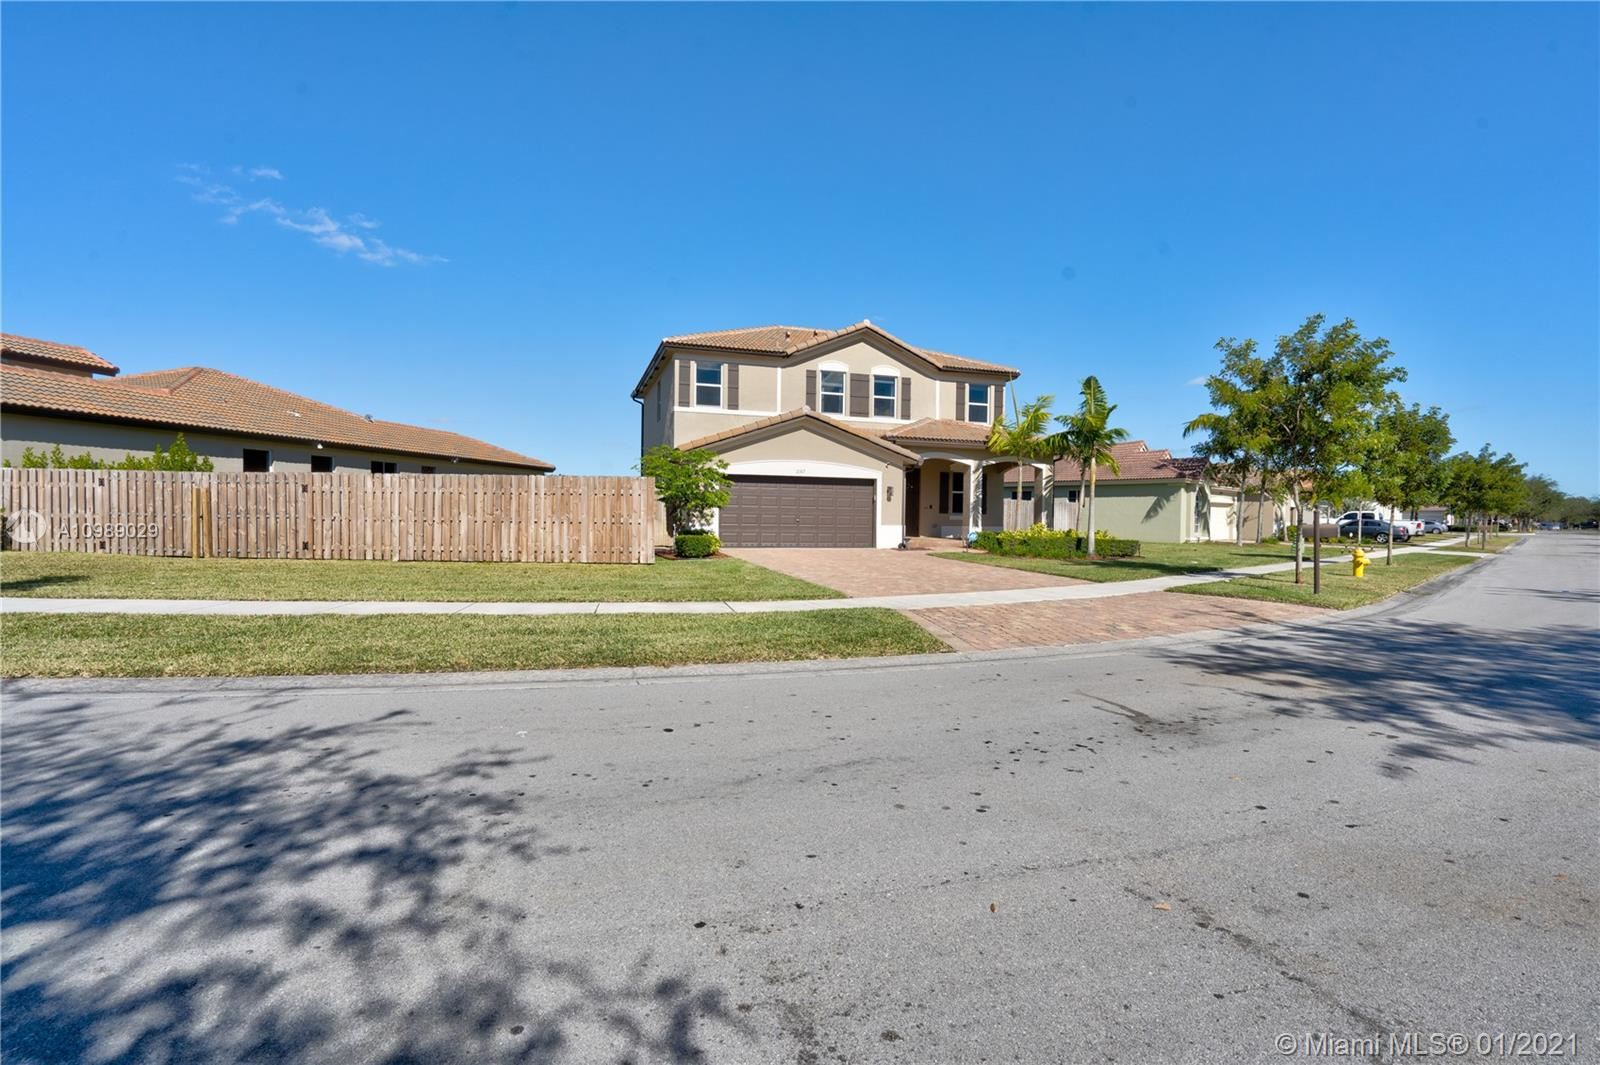 Photo of 2167 SE 2nd St, Homestead, FL 33033 (MLS # A10989029)